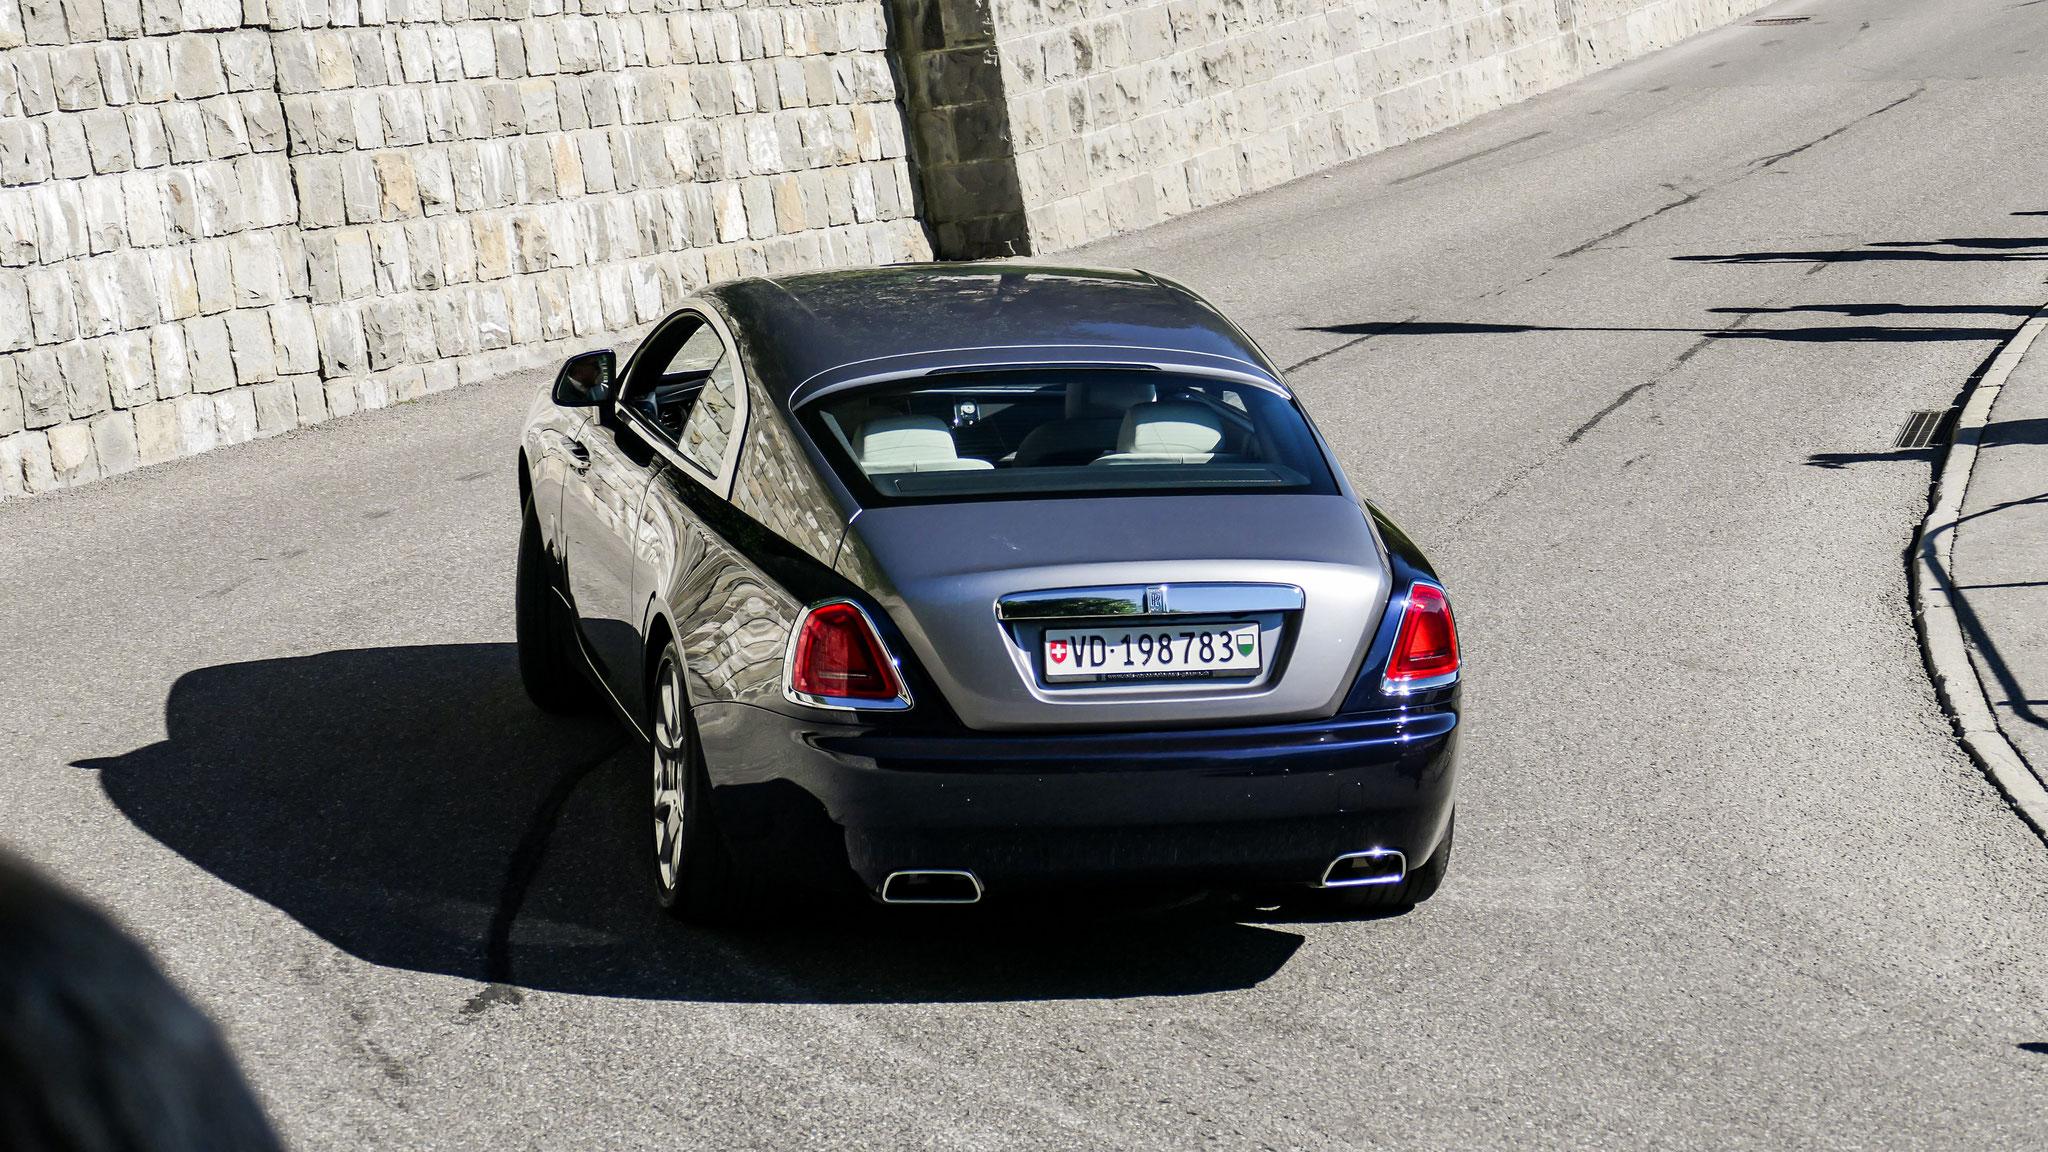 Rolls Royce Wraith - VD-198753 (CH)